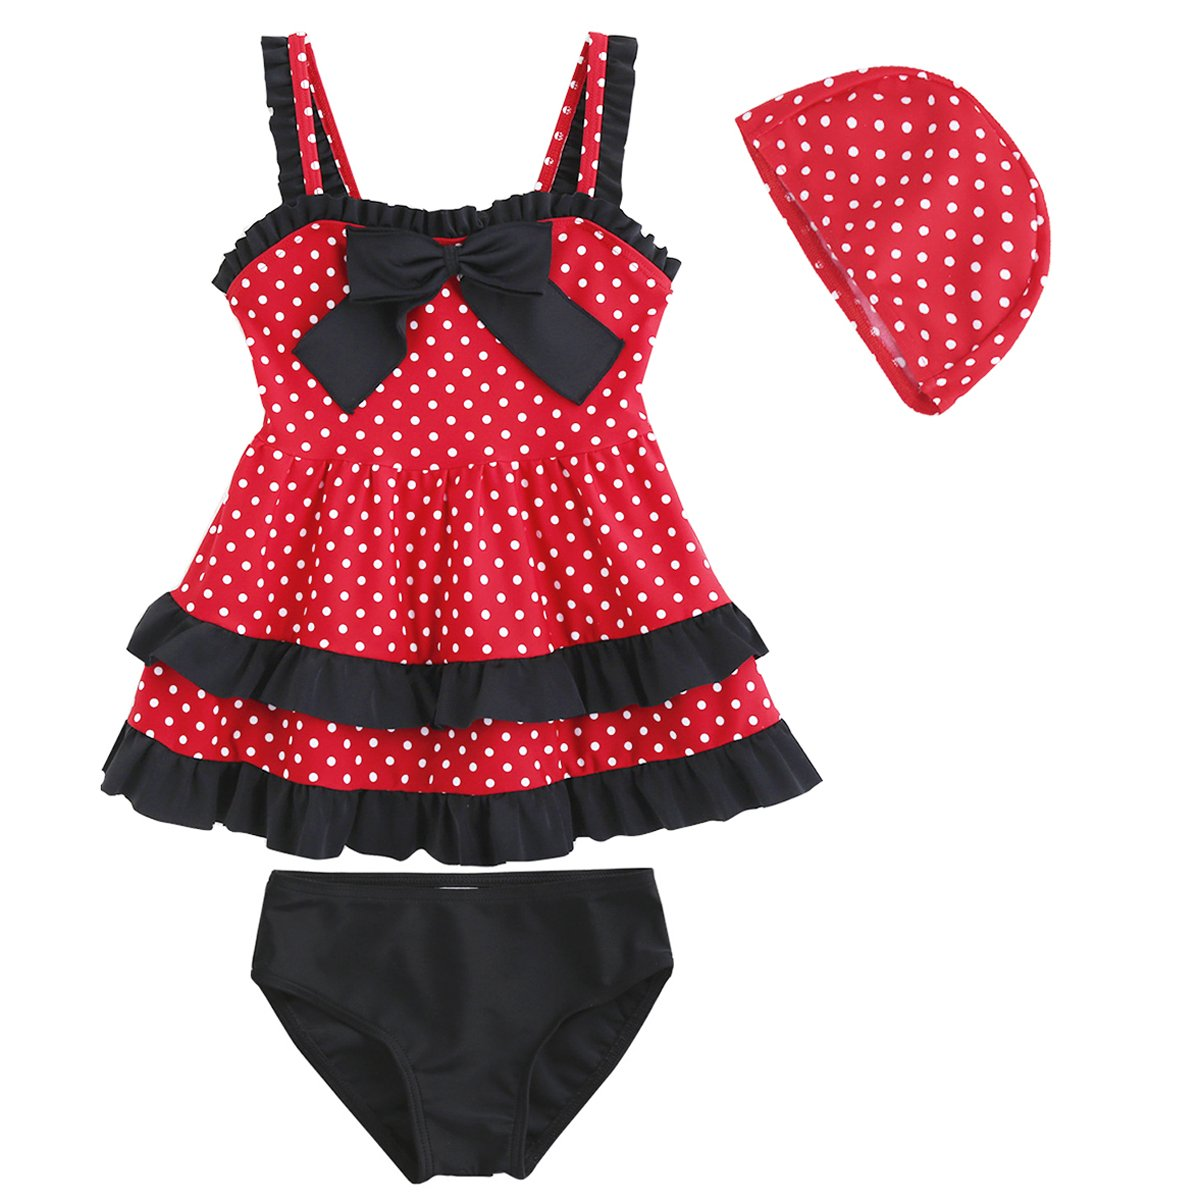 OBEEII Baby Girl Polka Dot Swimsuit Tankini Ruffle Top Dress Bottom Cap Bathing Suit